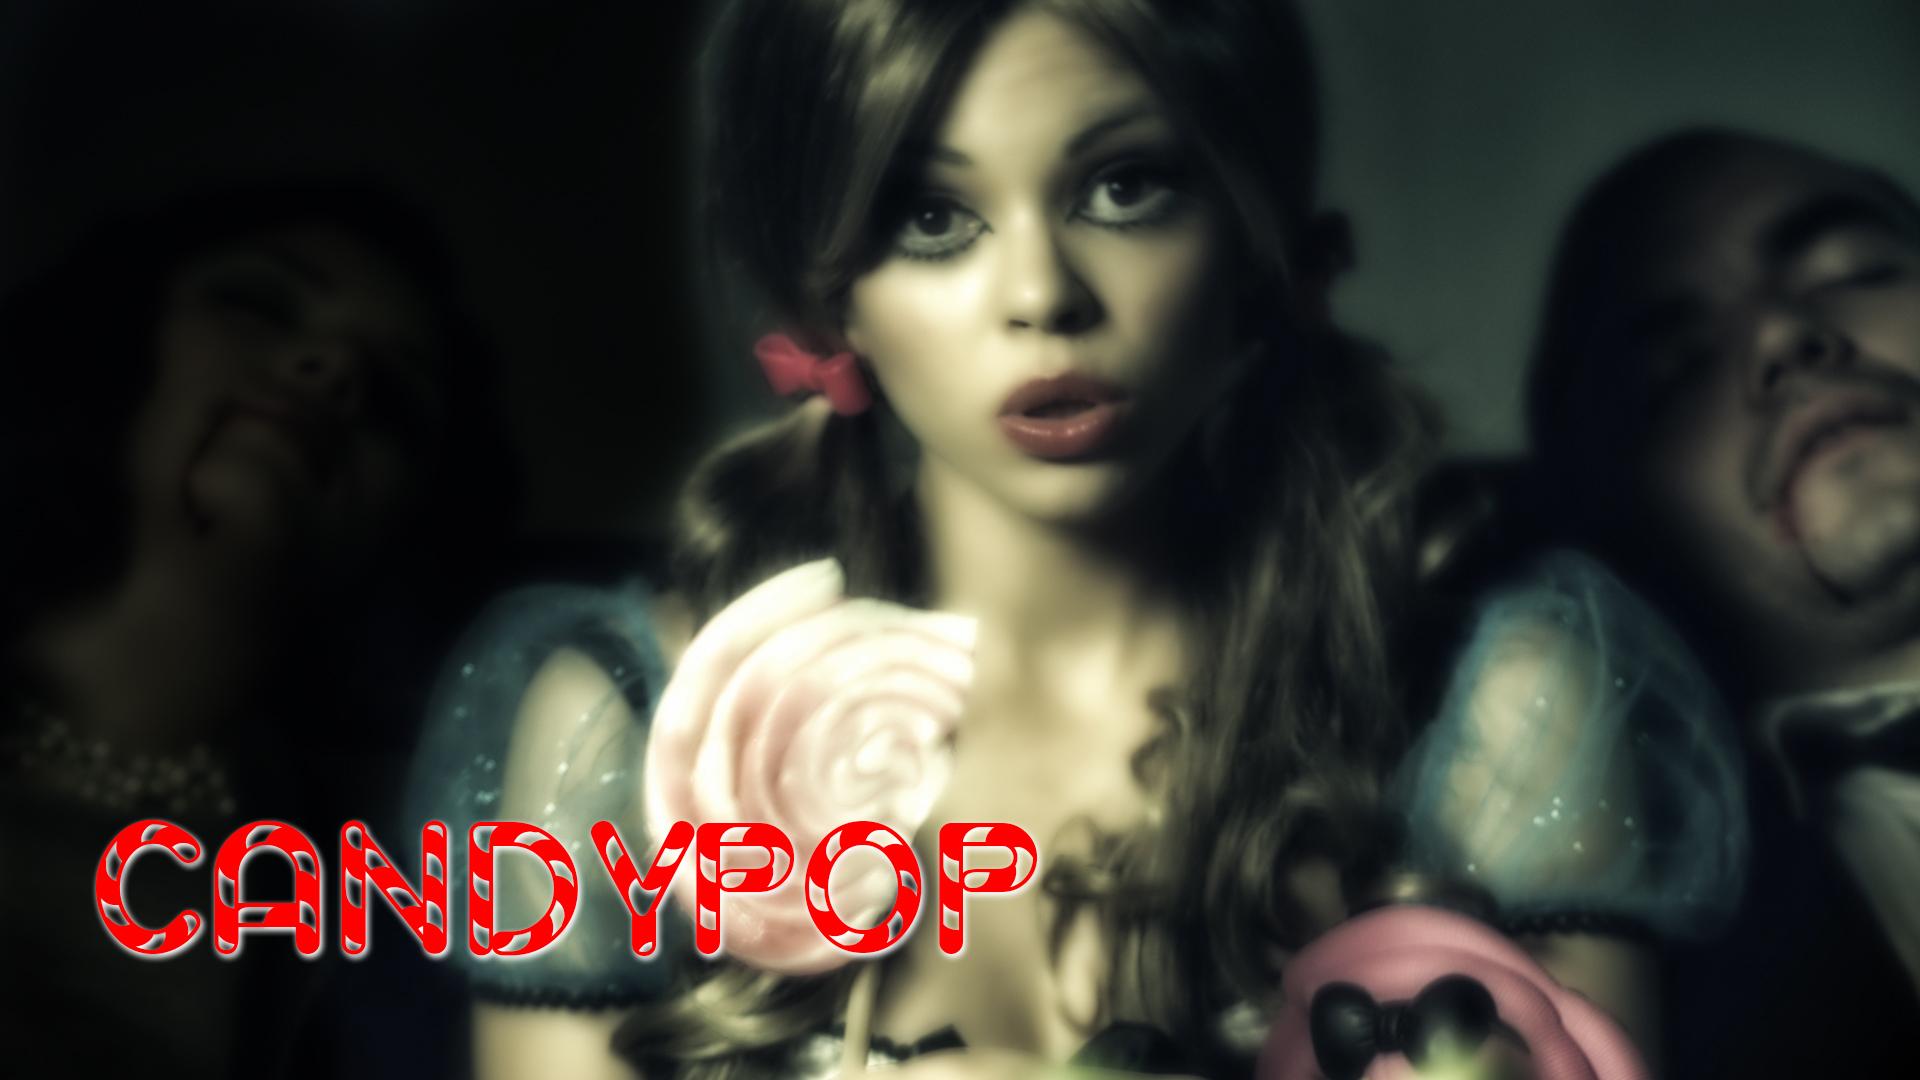 Candypop.jpg